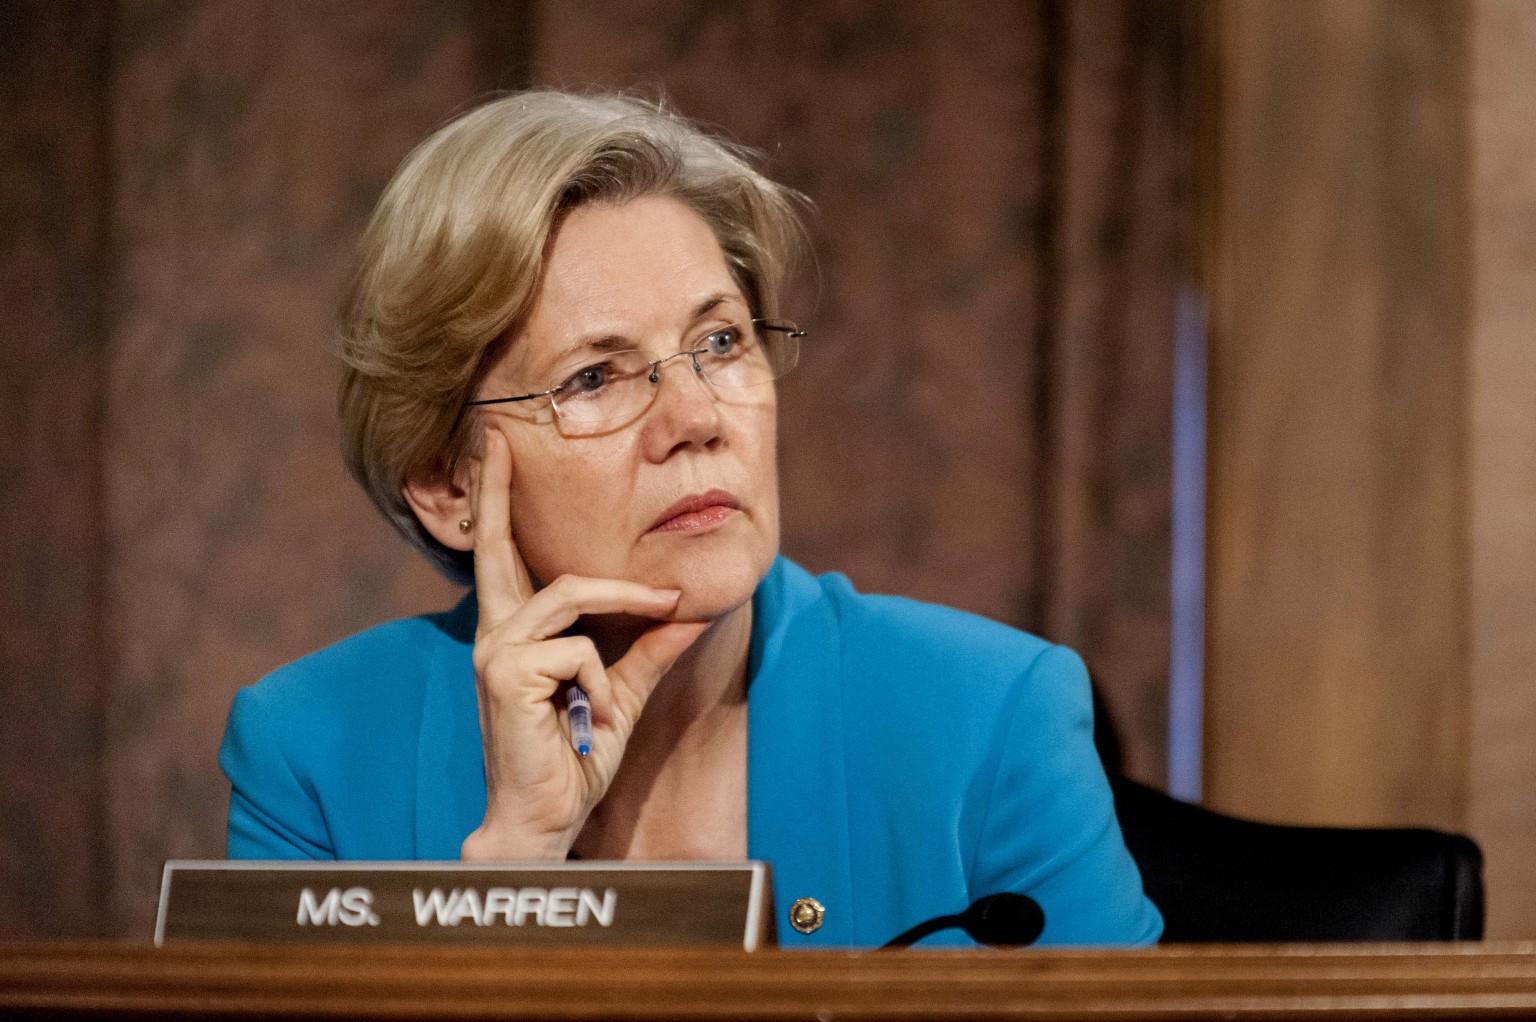 Elizabeth Warren Attacks Trump And GOP For 'Gutting' Ethics